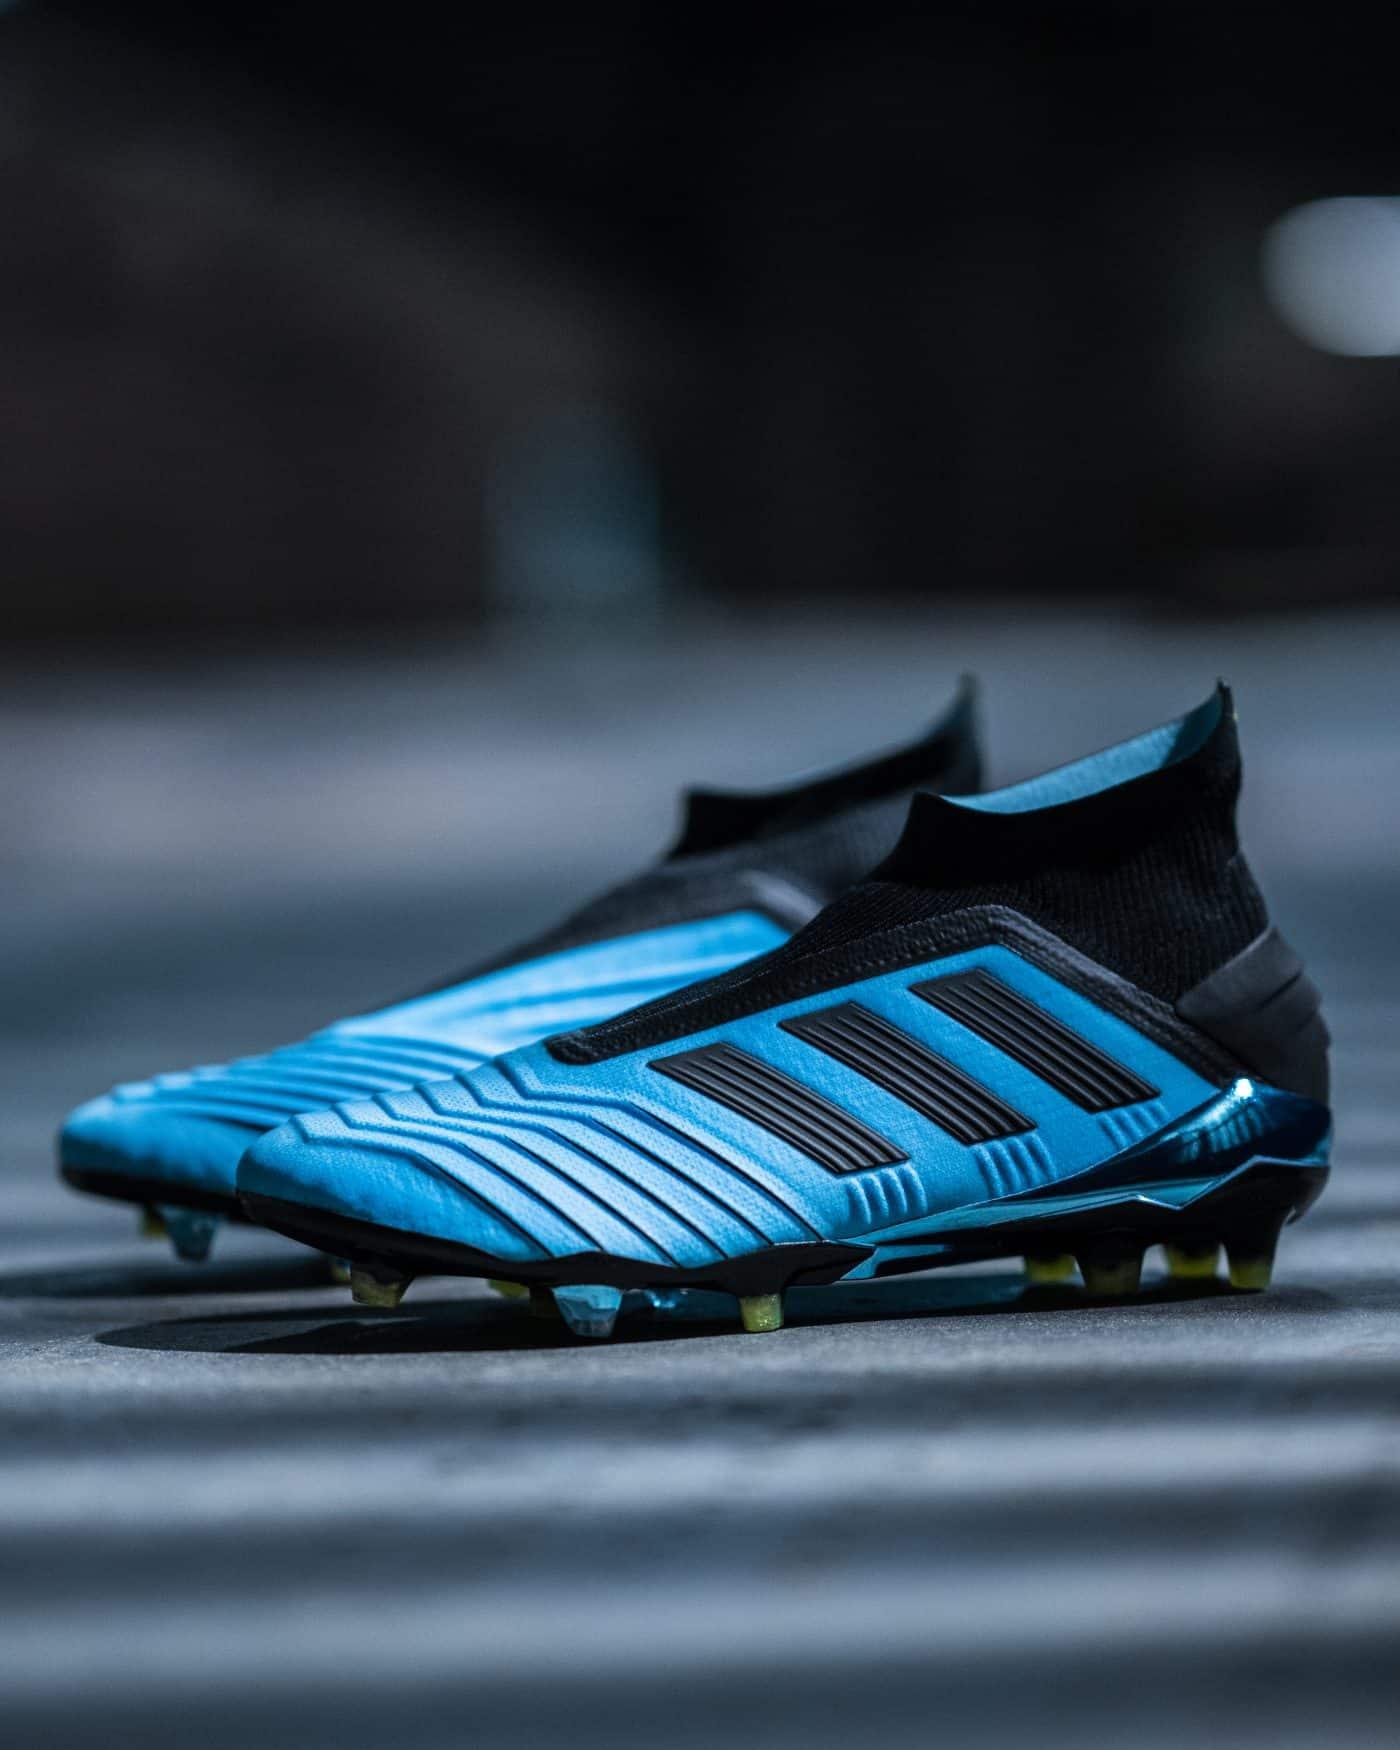 adidas-predator-19-pack-hard-wired-juillet-2019-2